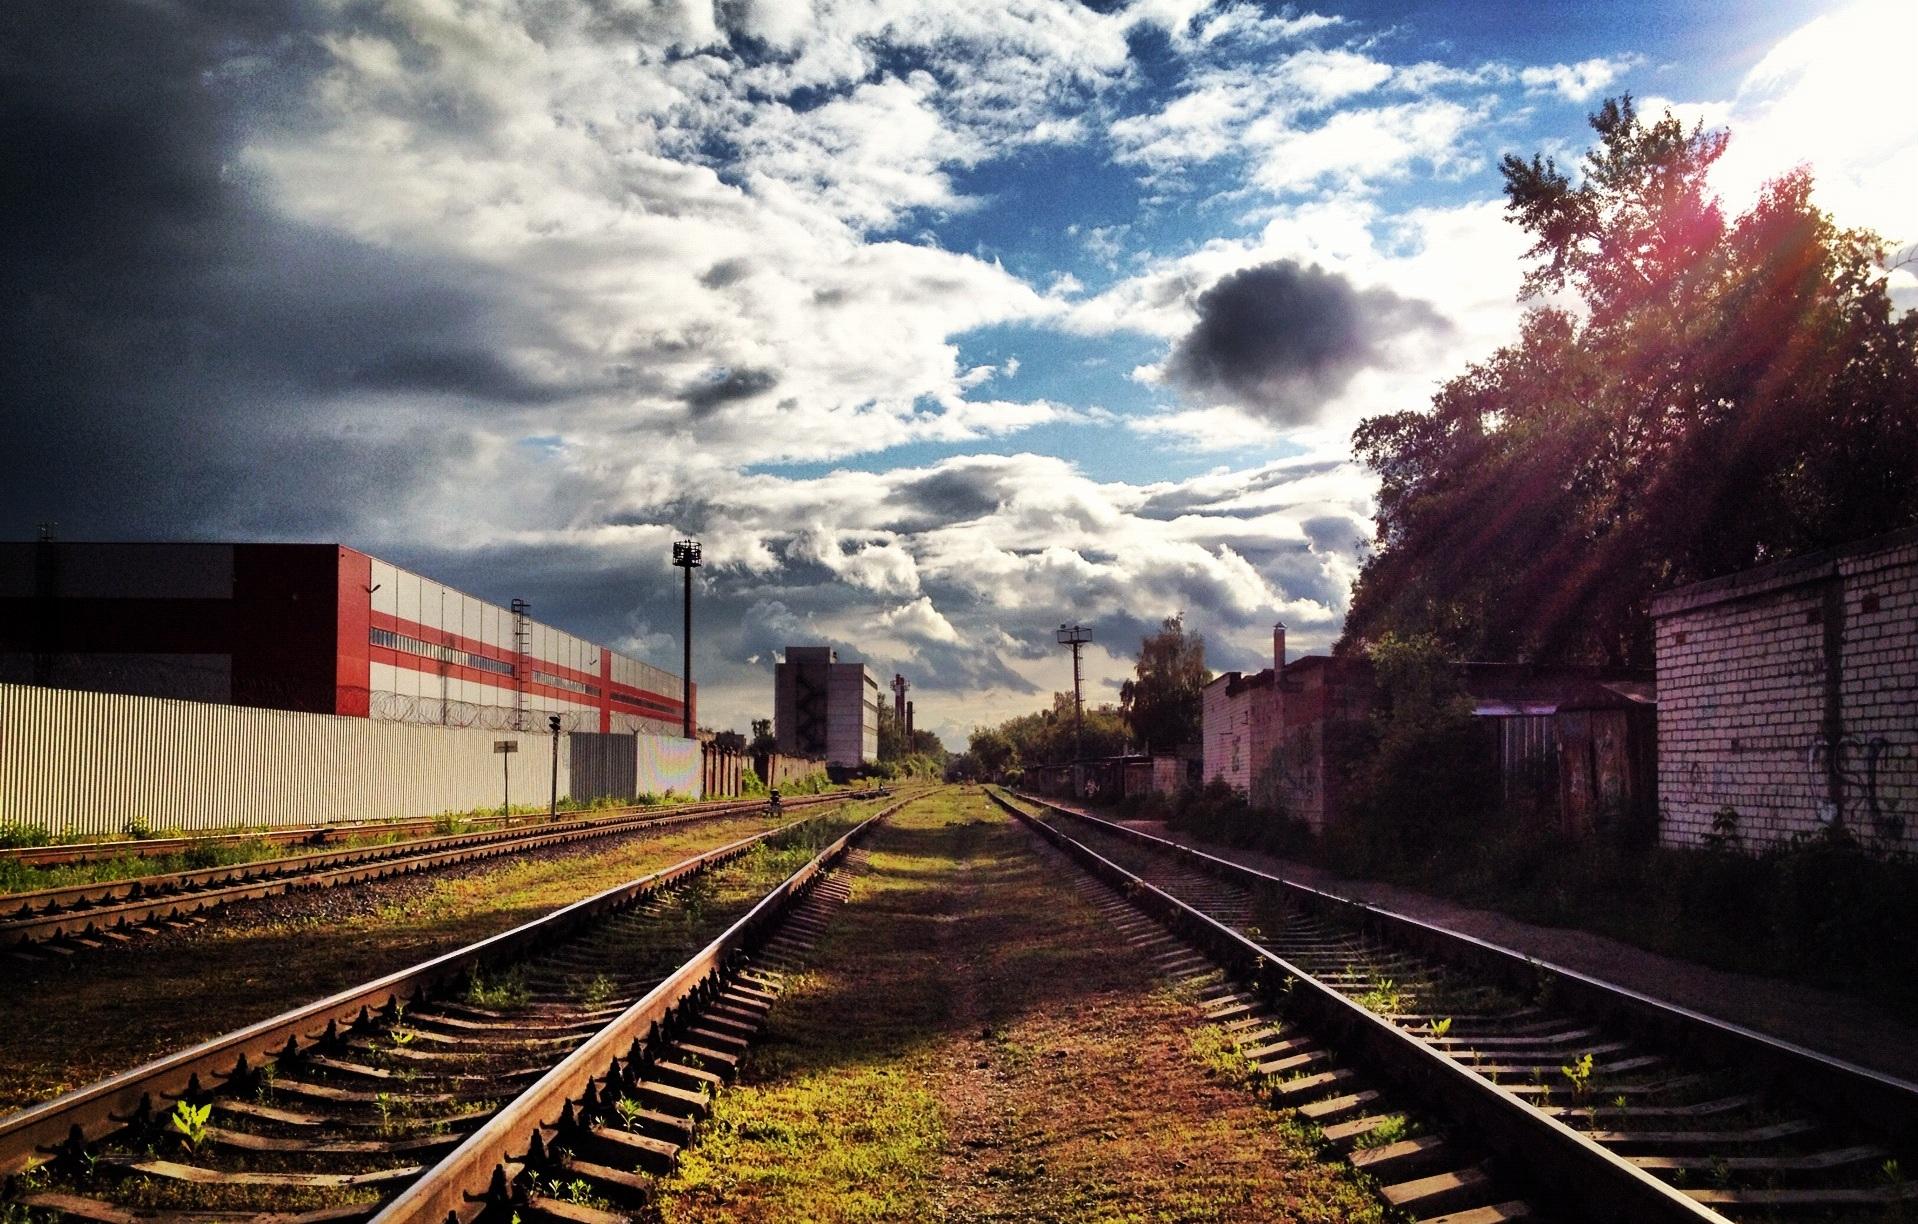 Industrial Landscape By Leshkaoo